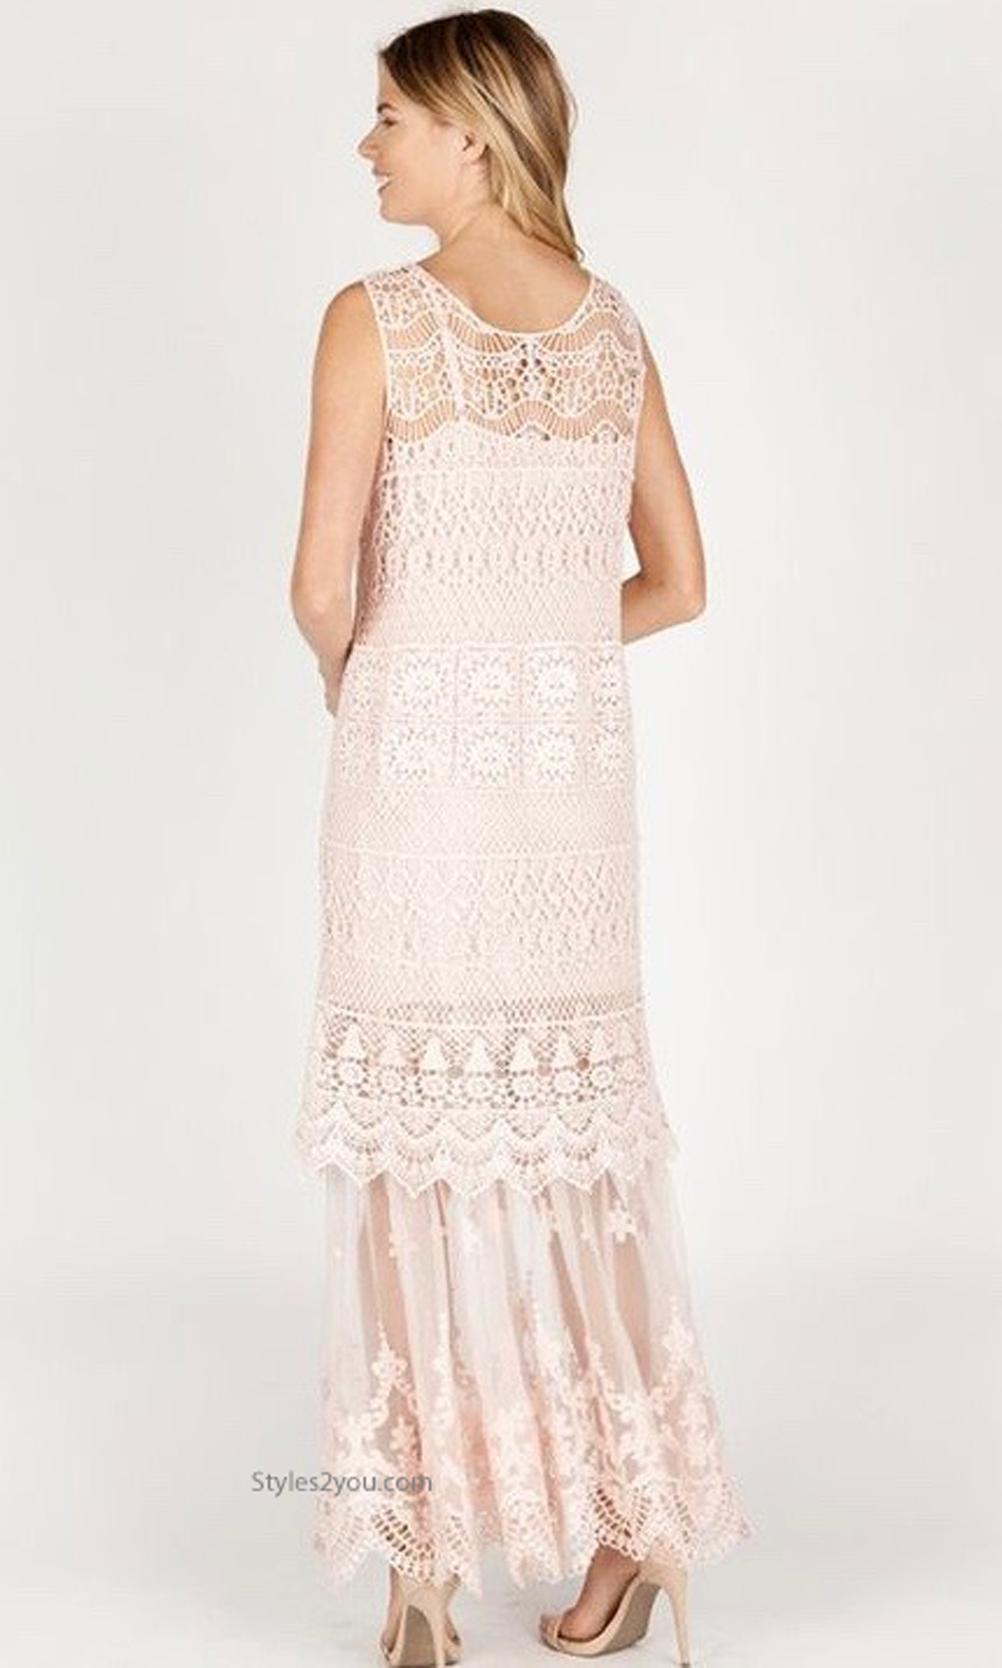 71e7b79b09a Biltmore Two Piece Crochet   Lace Maxi Dress Pale Pink Monoreno ...